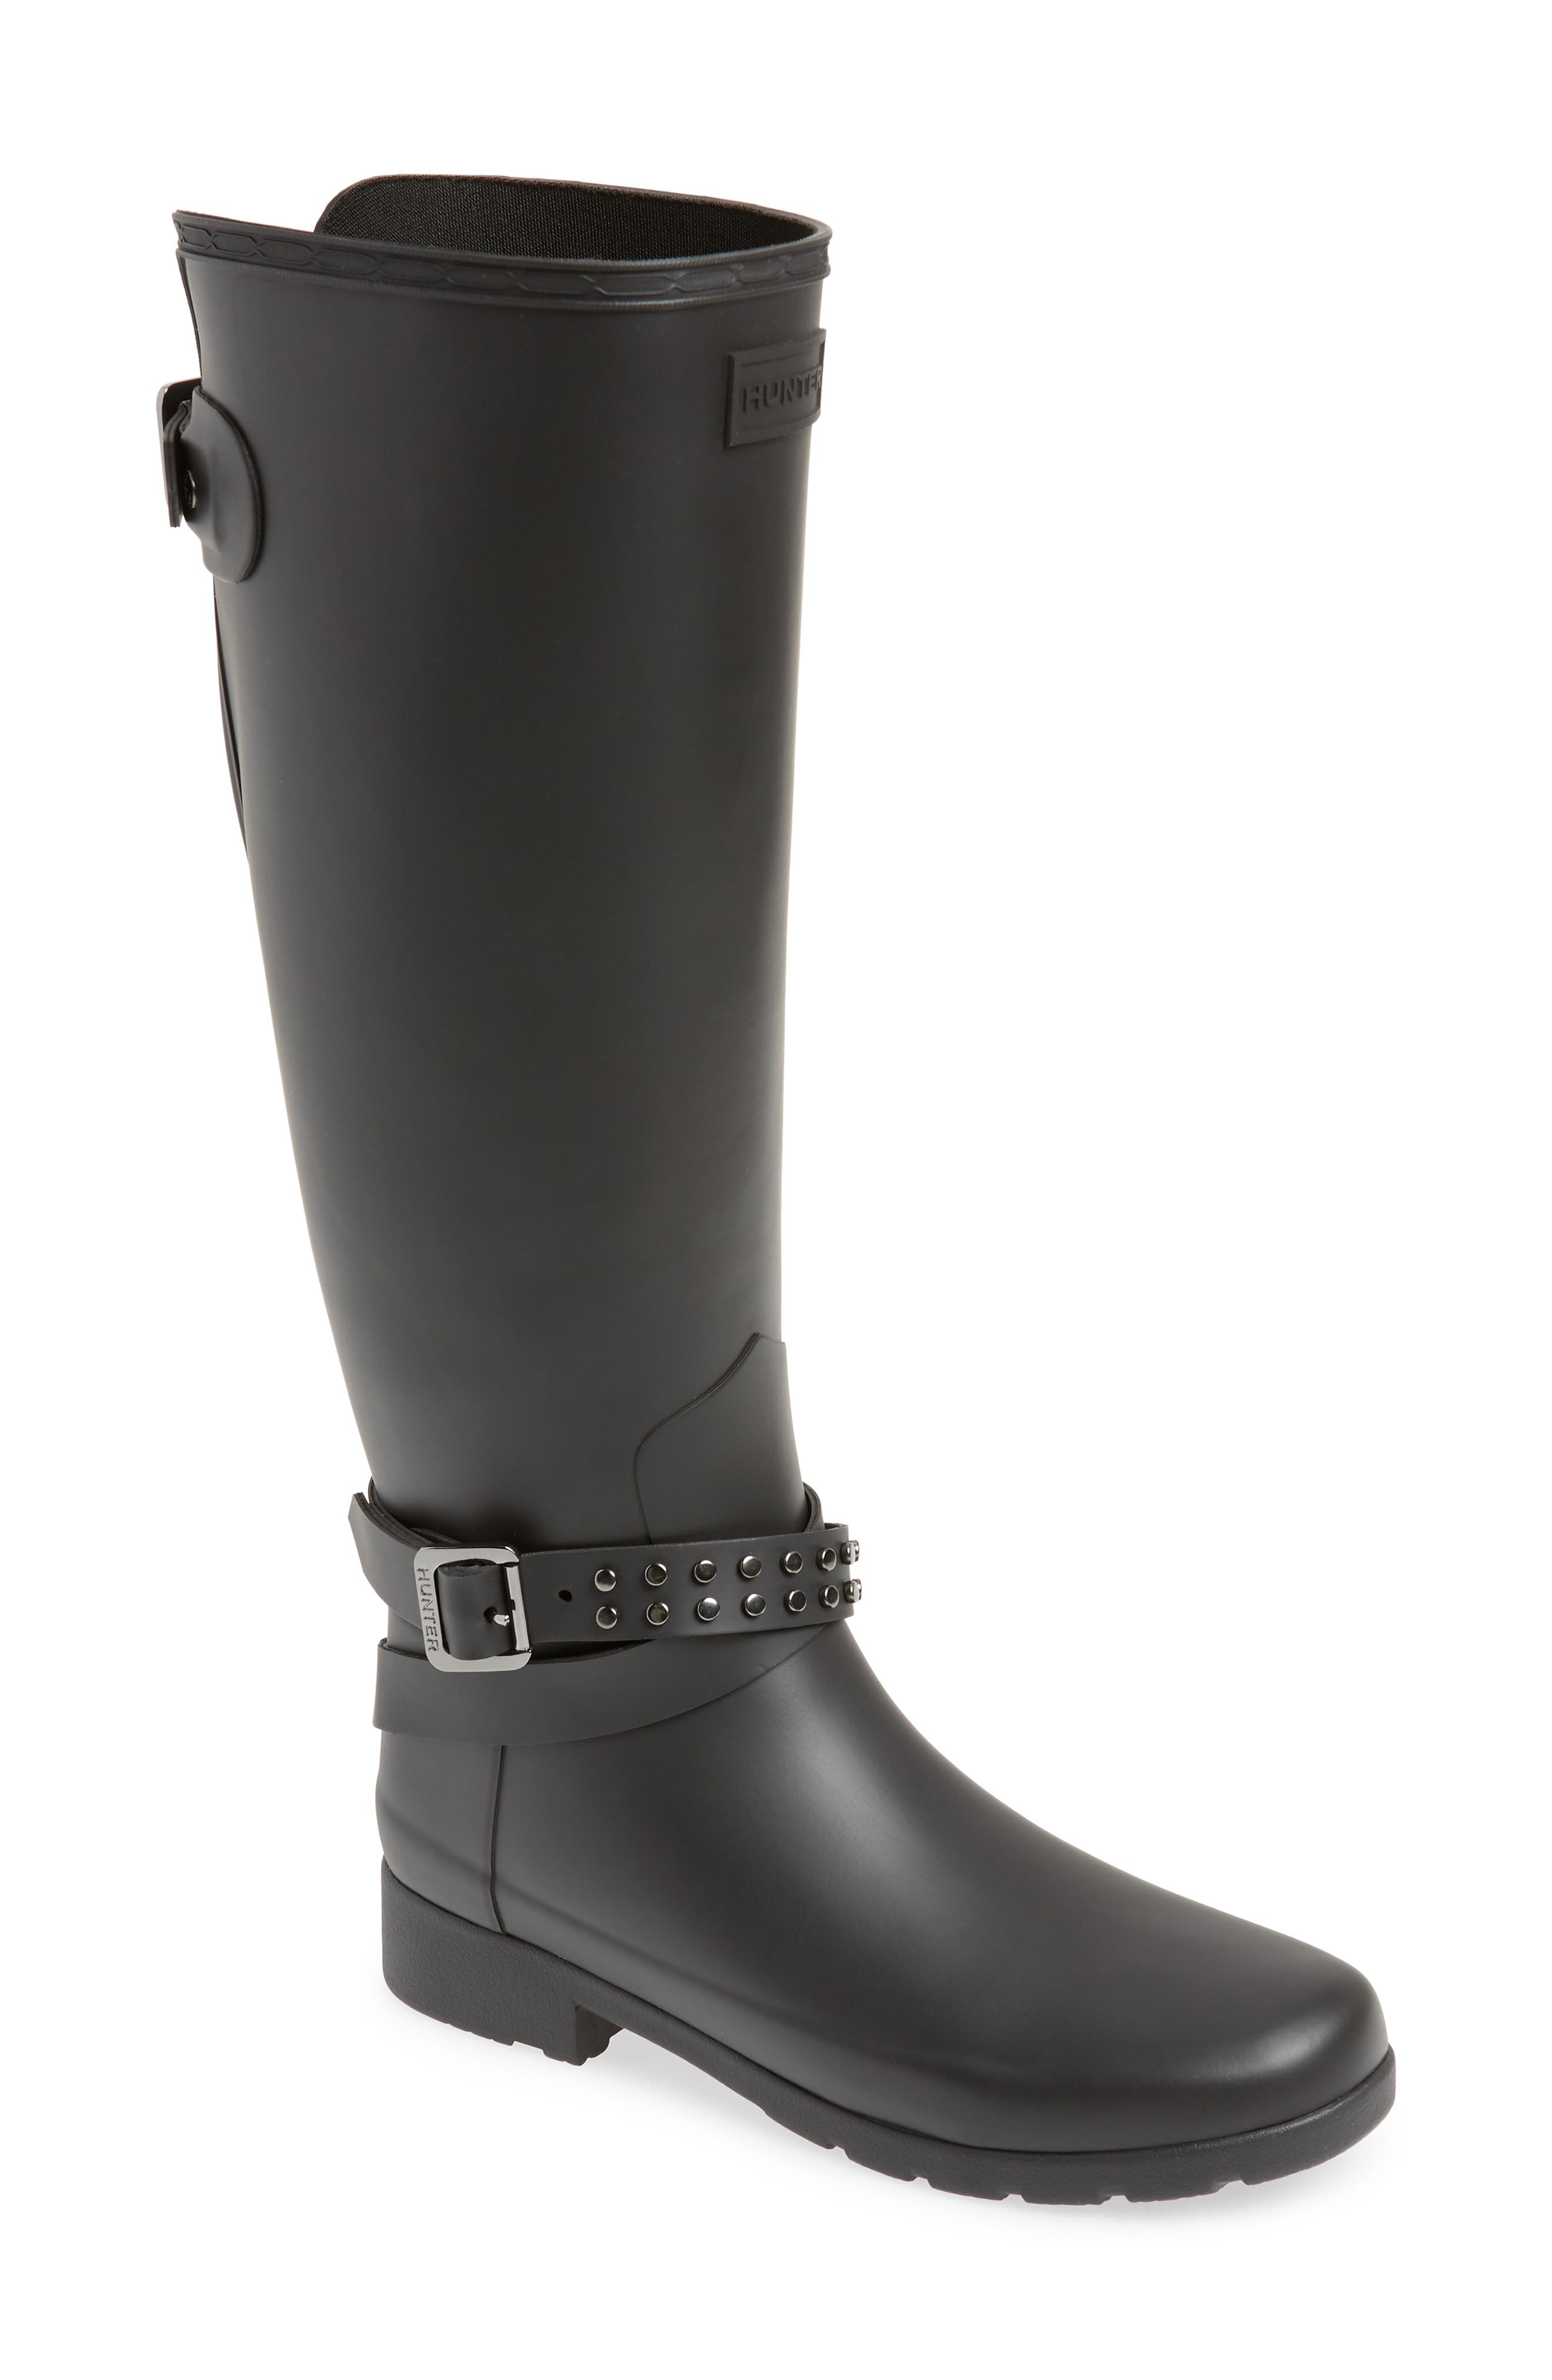 HUNTER, Refined Adjustable Back Knee High Waterproof Rain Boot, Main thumbnail 1, color, BLACK